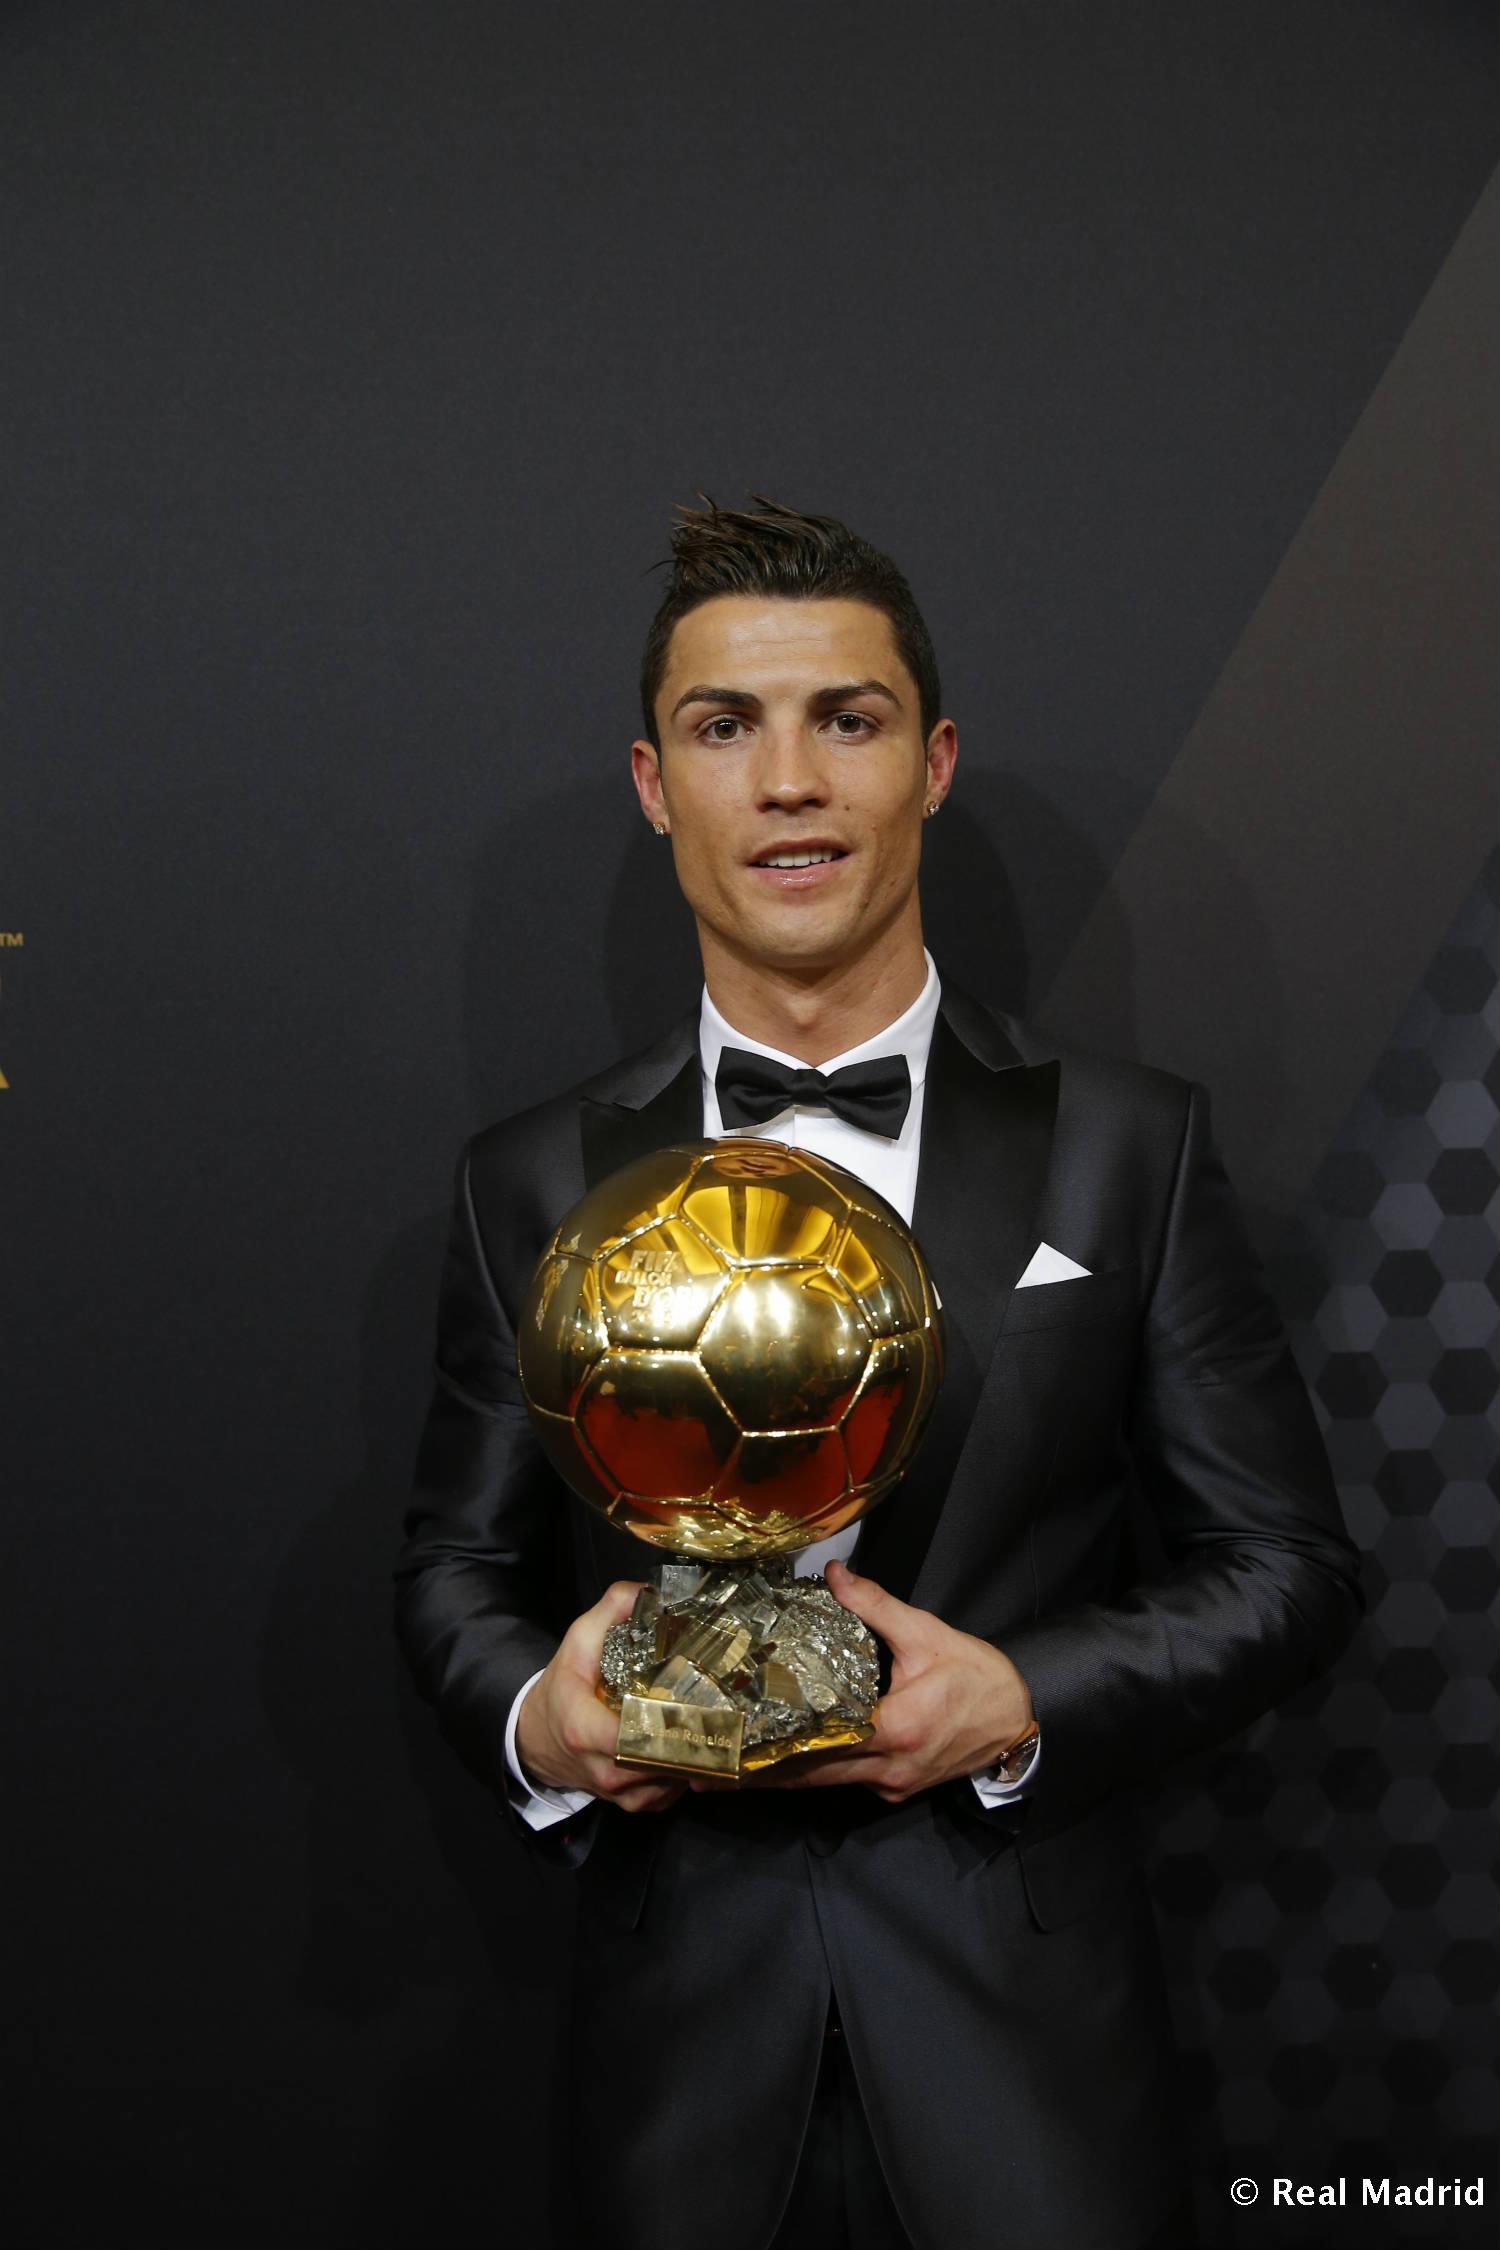 Atrevidas Cristiano Foto Ronaldo Elio Camel Nokha Slip On Man Cokelat Muda 39 14